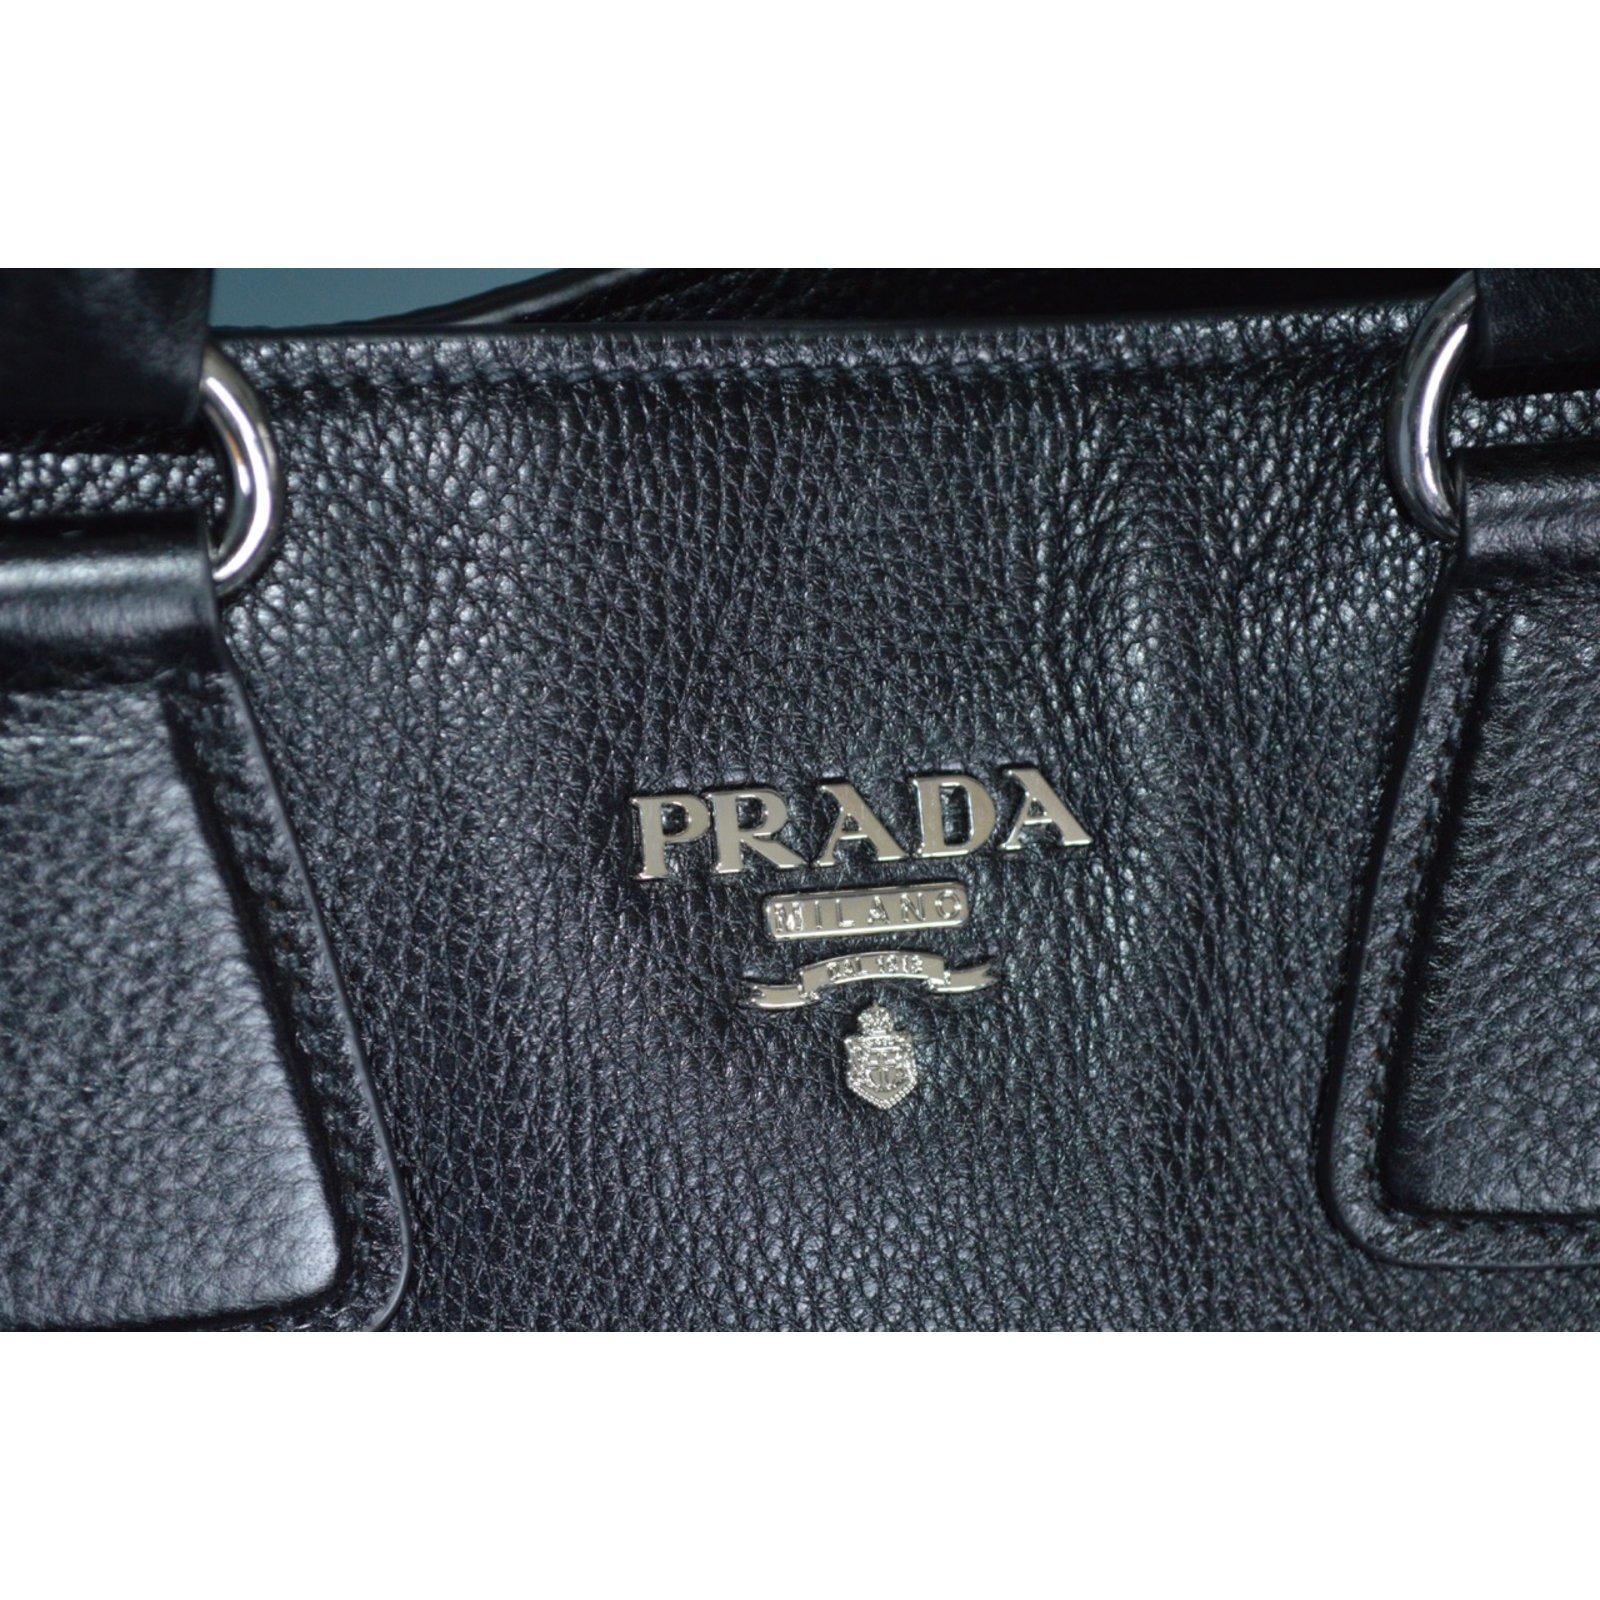 06958fc7e9be Prada BN2419 vitello phenix black leather tote shoulder bag Handbags  Leather Black ref.23394 - Joli Closet